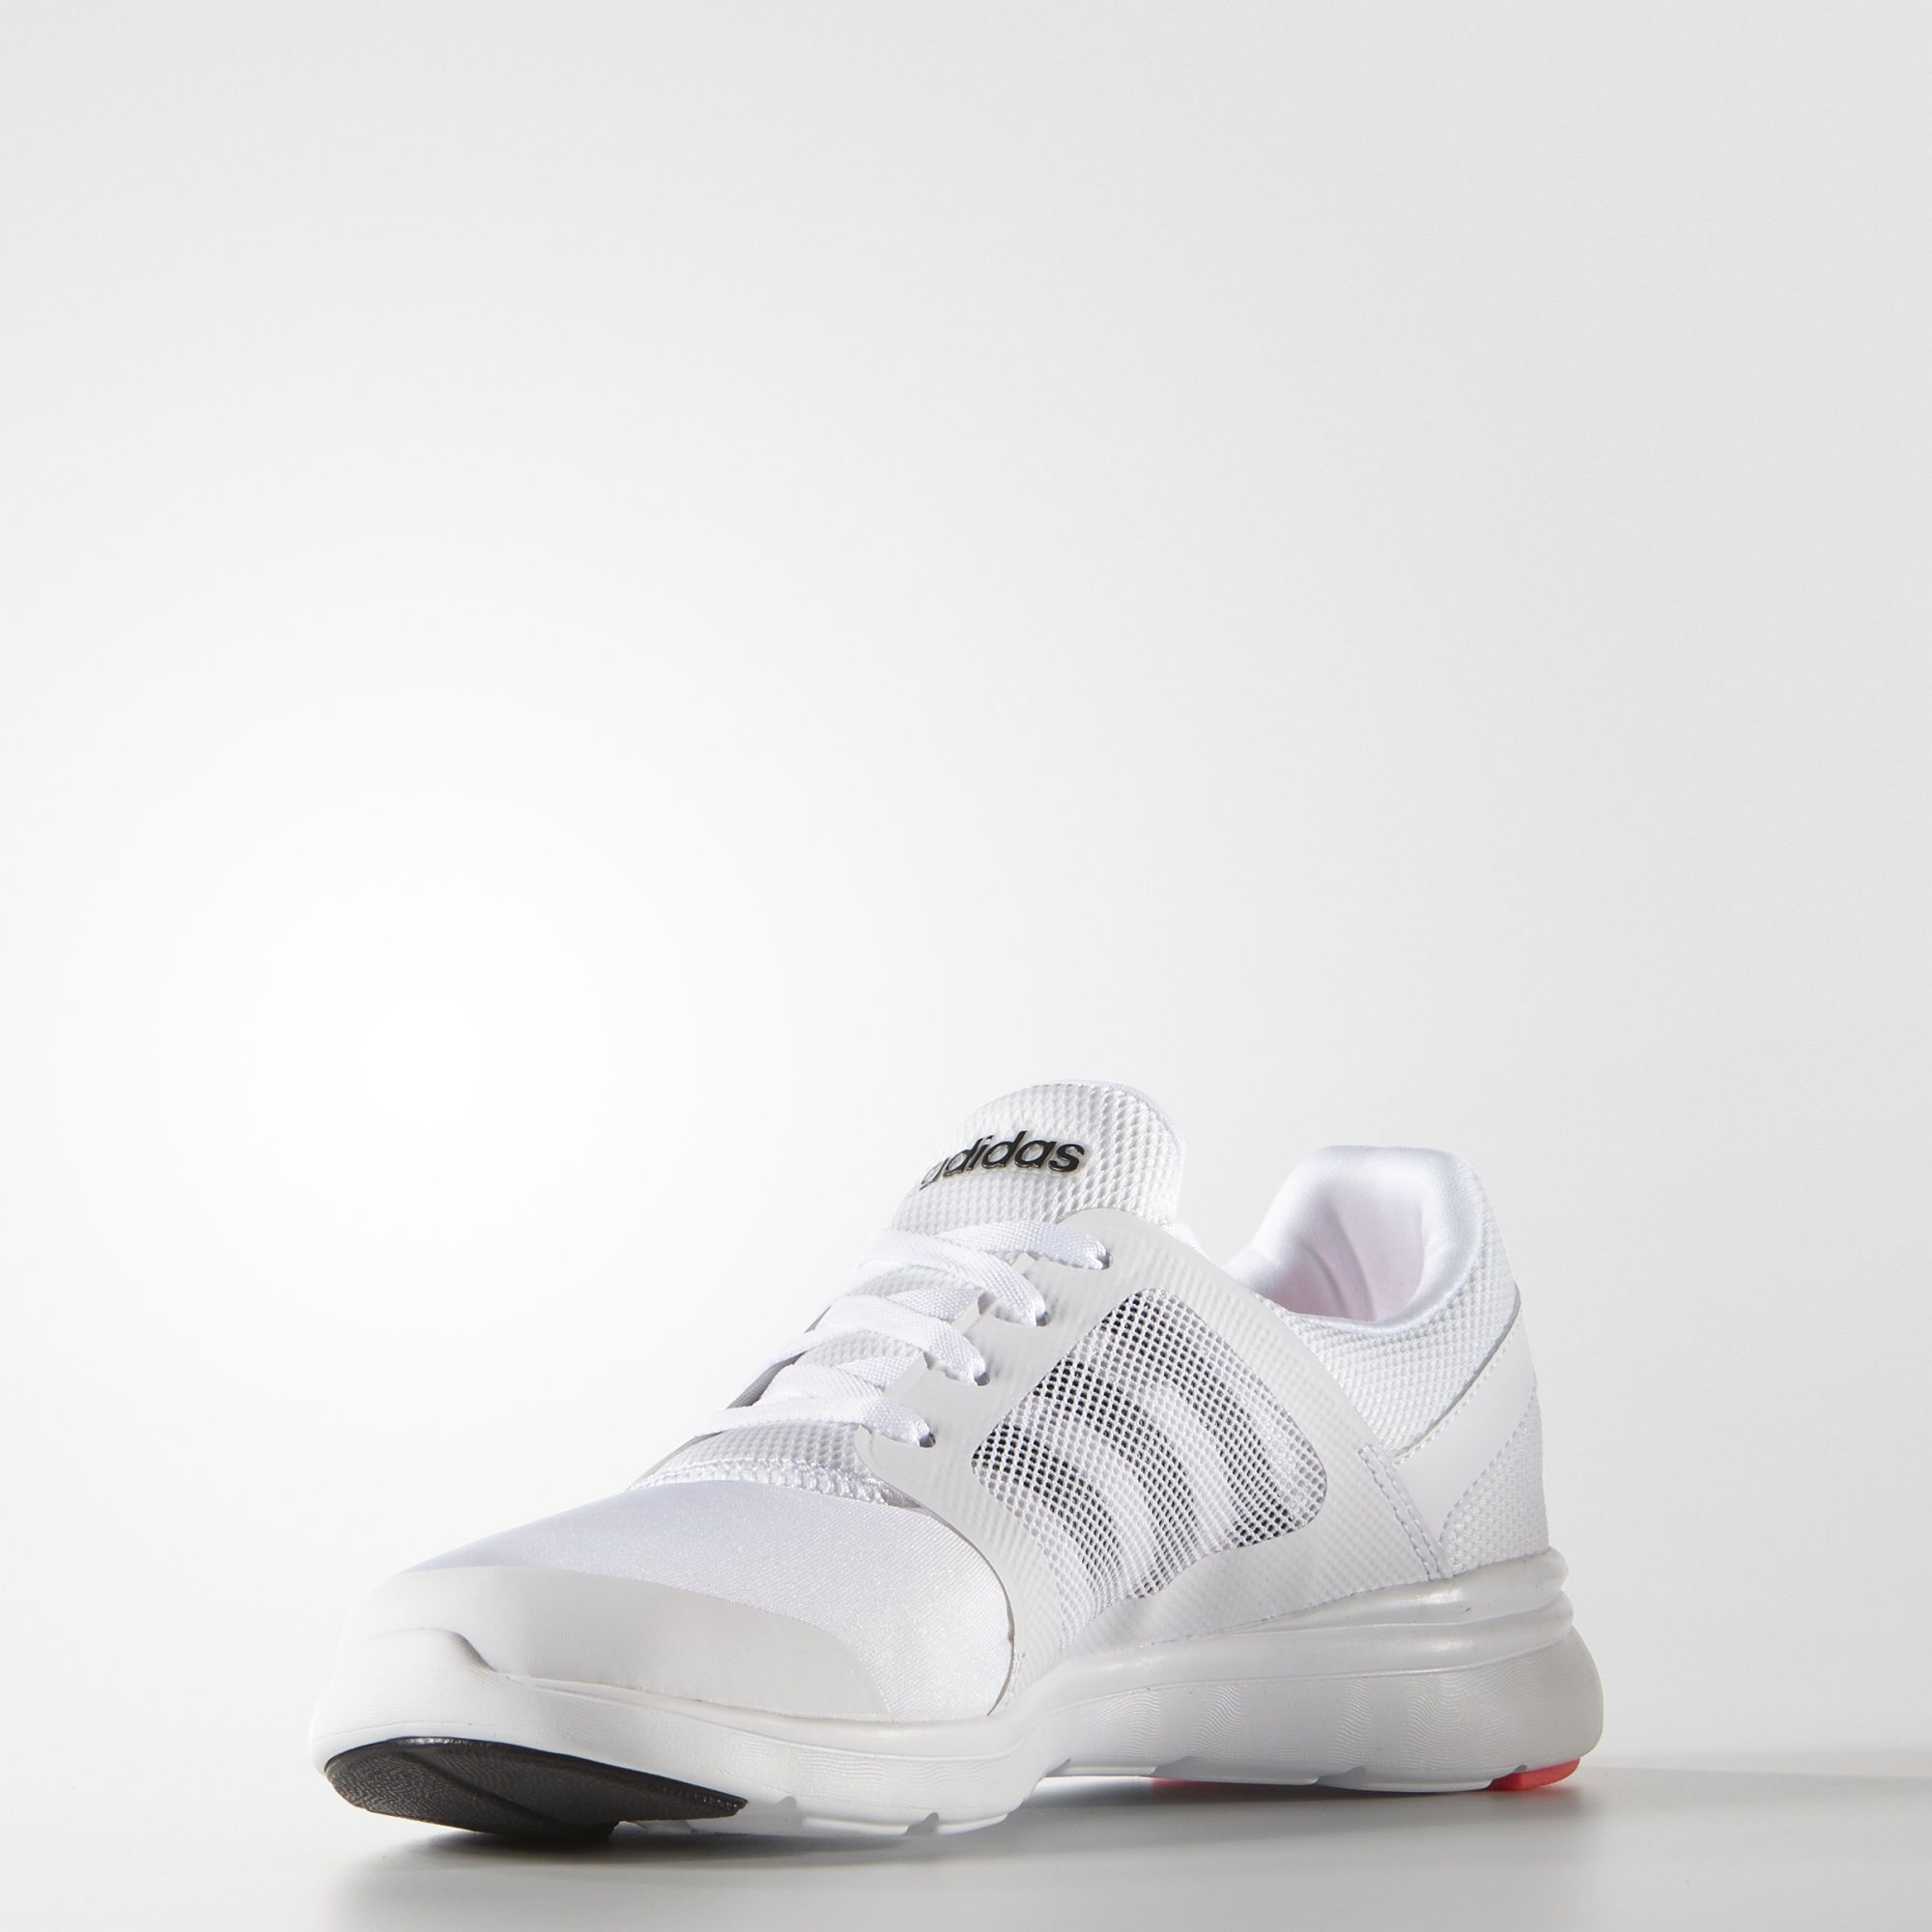 Adidas Neo Cloudfoam Xpression